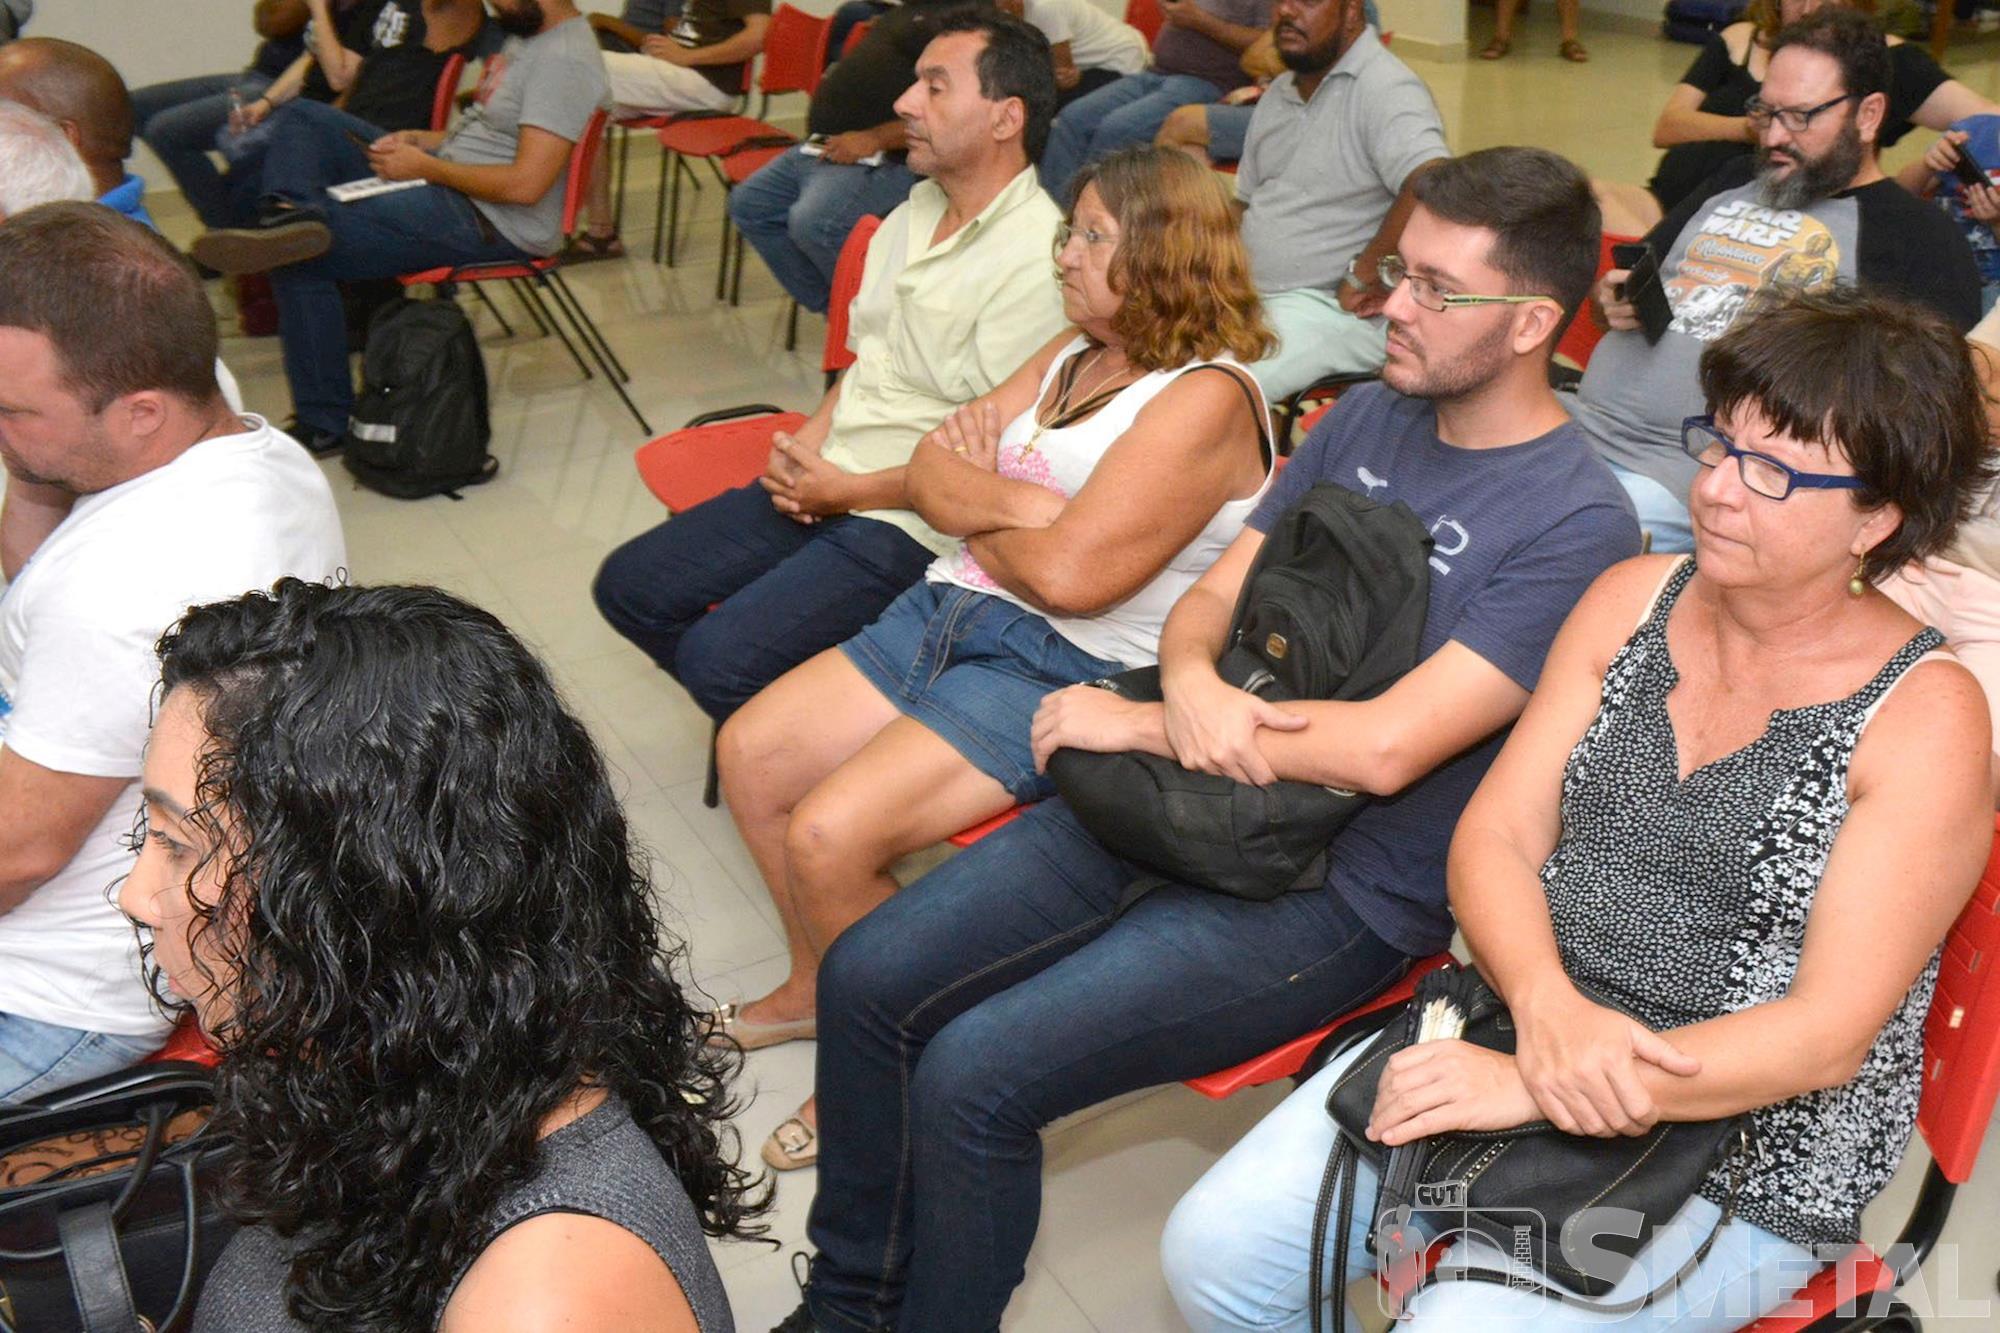 Palestra com Leonardo Sakamoto no SMetal Sorocaba, sakamoto; palestra; formação; jornalista; sindicato;, Foguinho/Imprensa SMetal